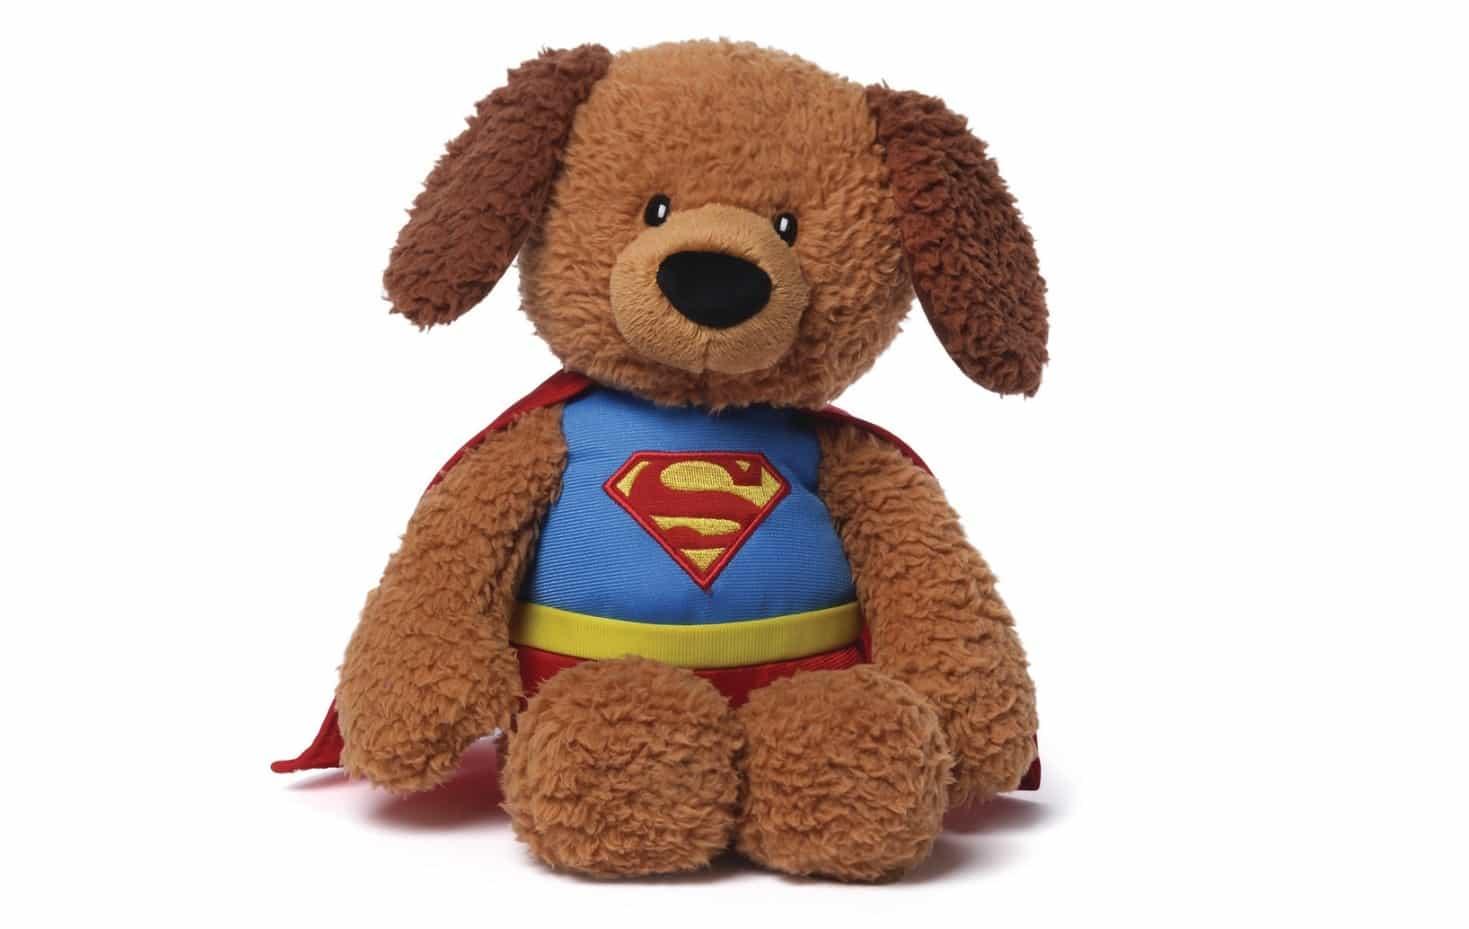 Plush Stuffed Toys : Five cute stuffed animals dressed as superheroes